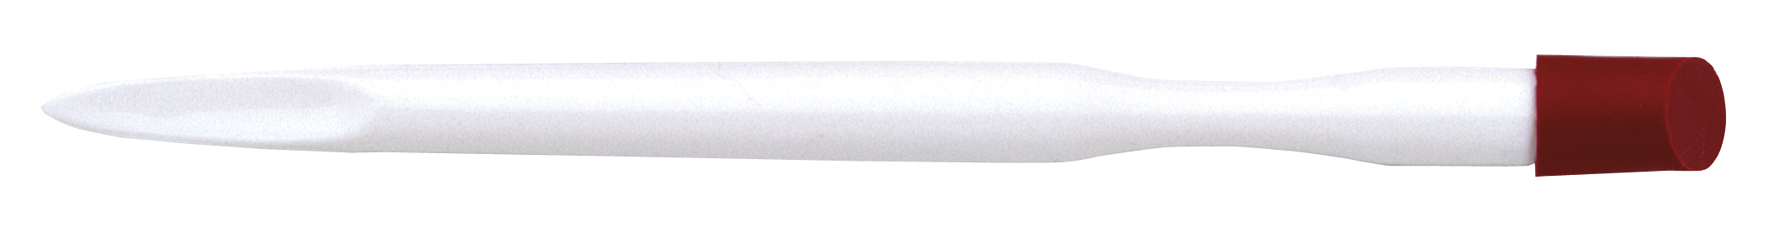 Solingen tvarovač nehtového lůžka White